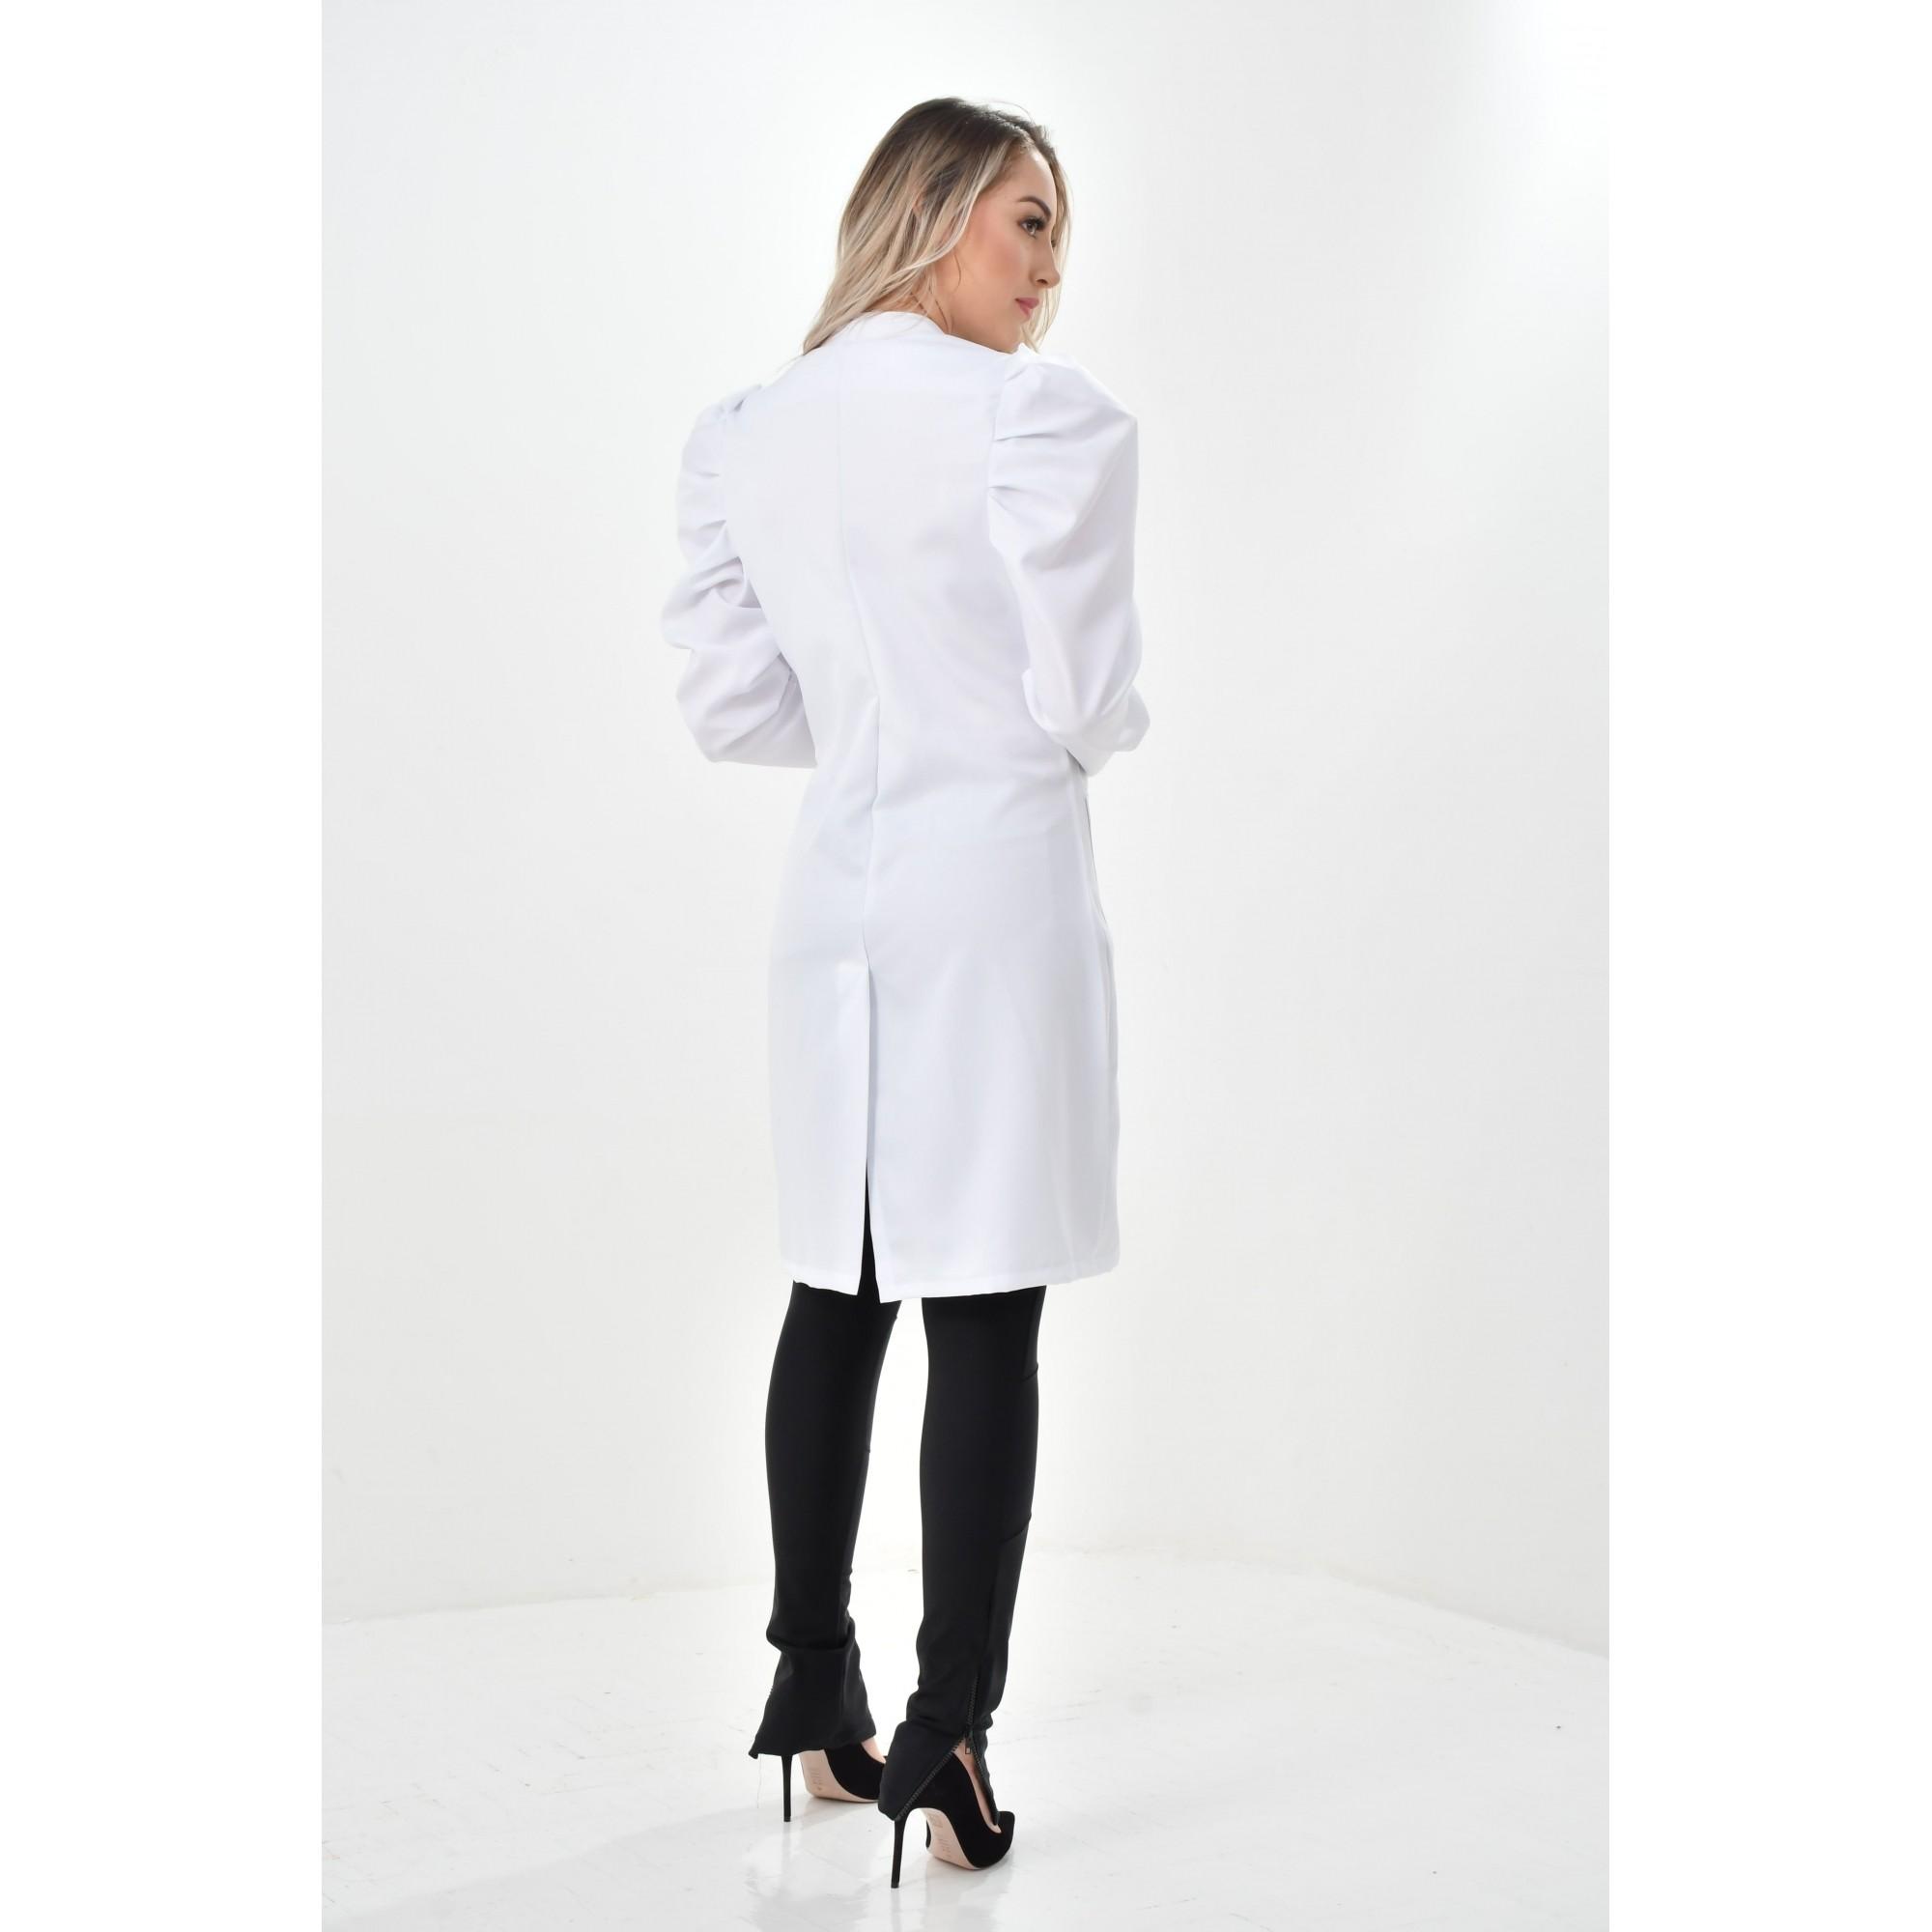 Jaleco Rafaela  - Luxo Branco - Jalecos Personalizado Feminino